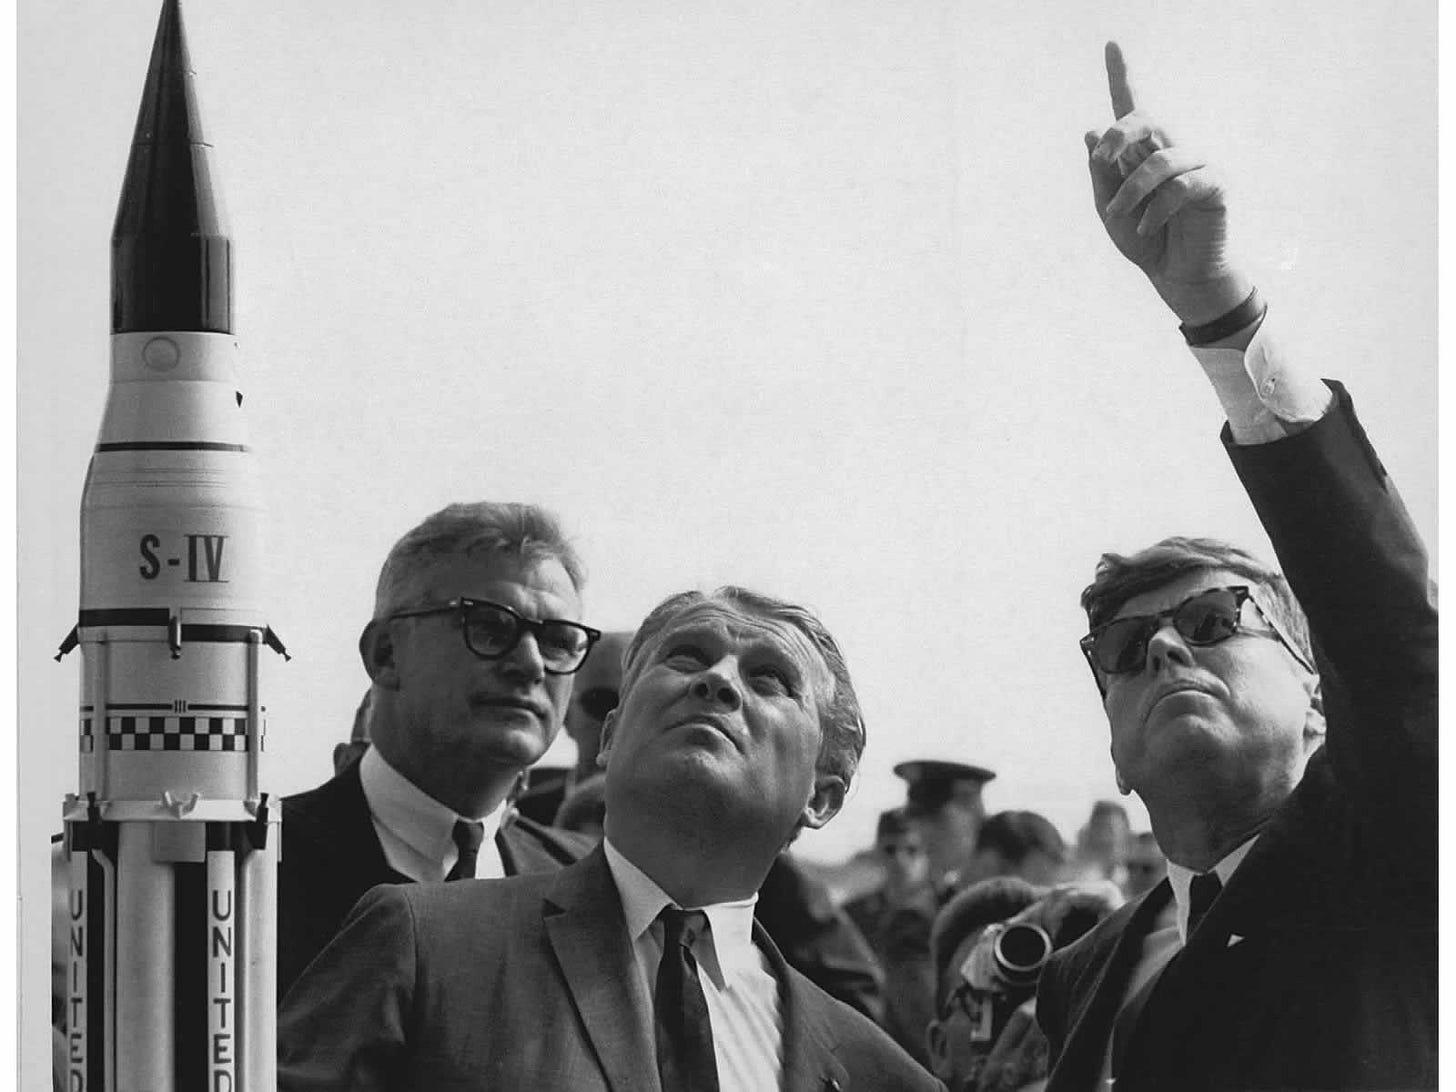 Photograph of JFK pointing skyward